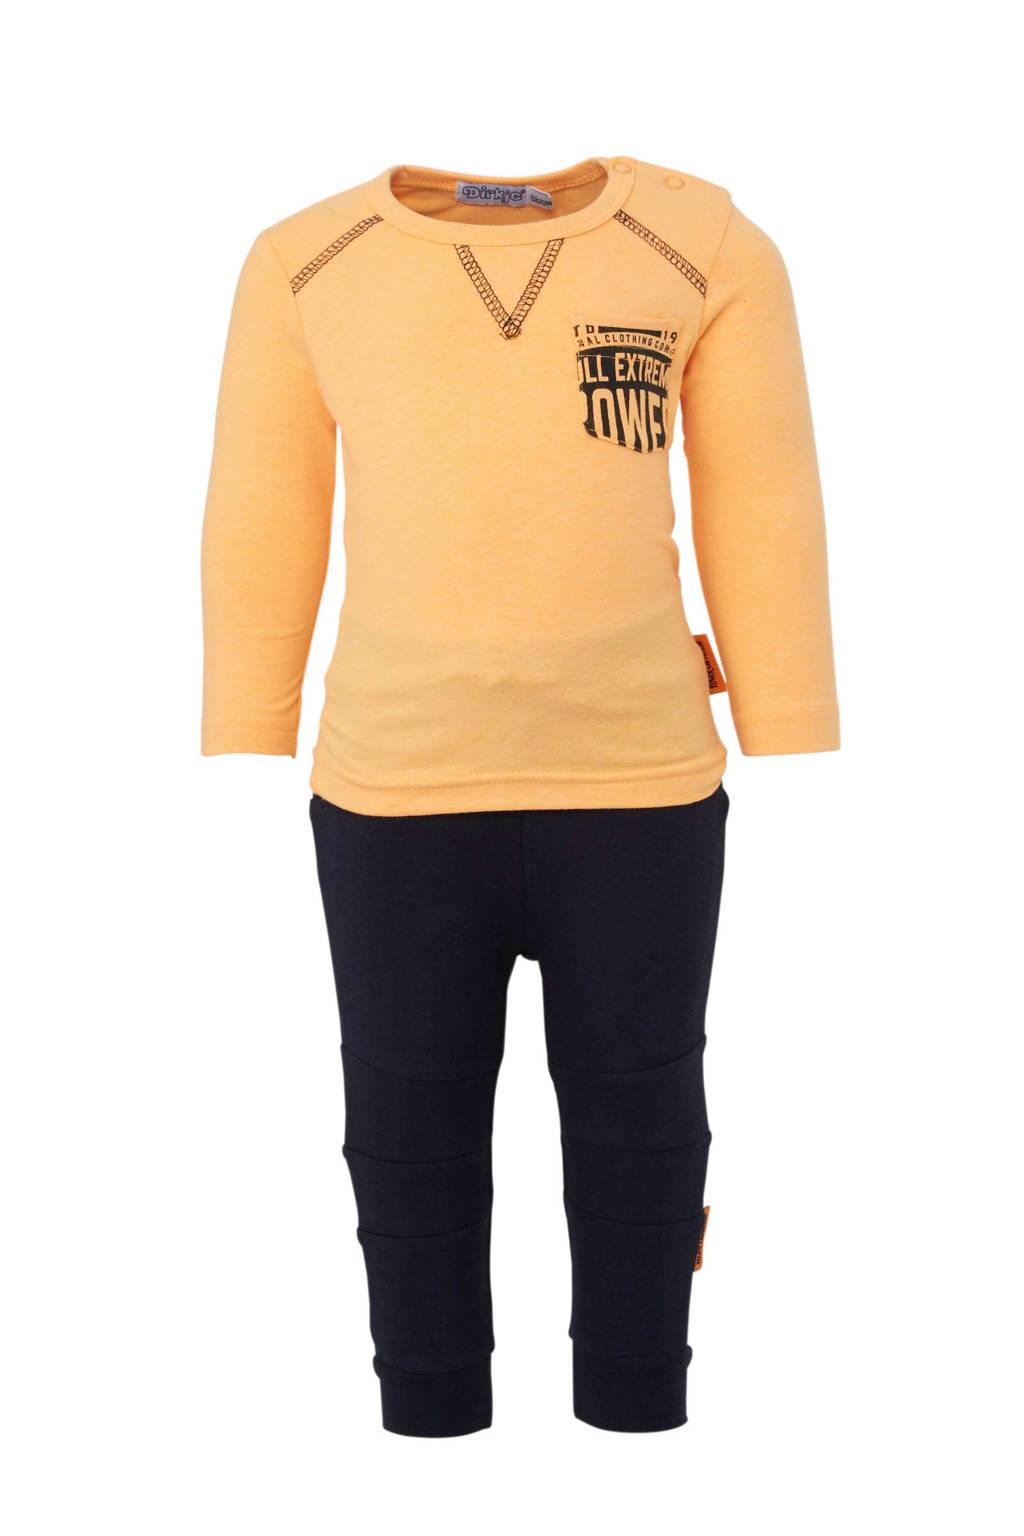 Dirkje joggingbroek met longsleeve oranje/donkerblauw, Oranje/donkerblauw